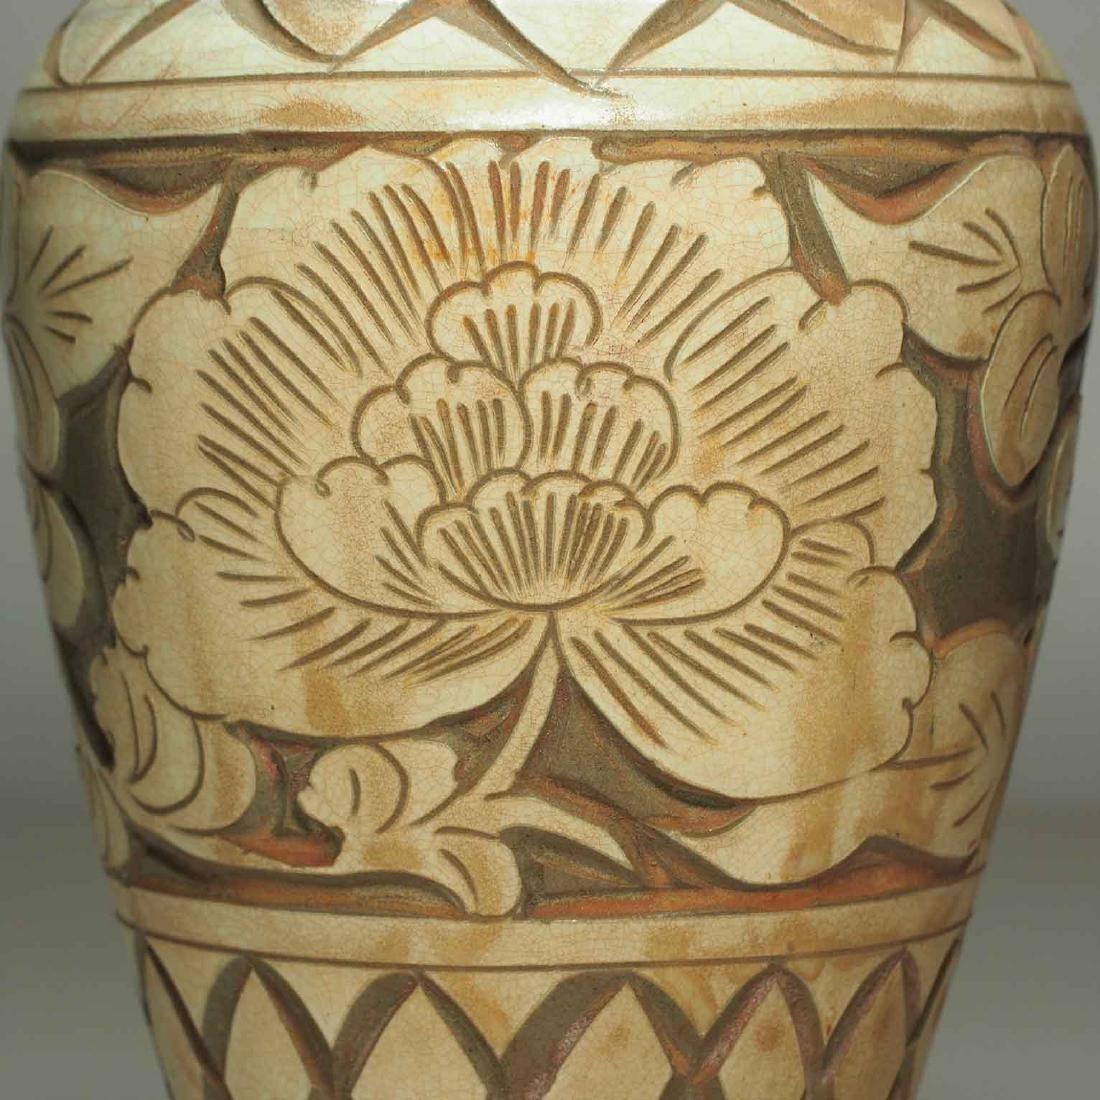 Cizhou Vase with Sgraffito Peony, Yuan Dynasty - 10